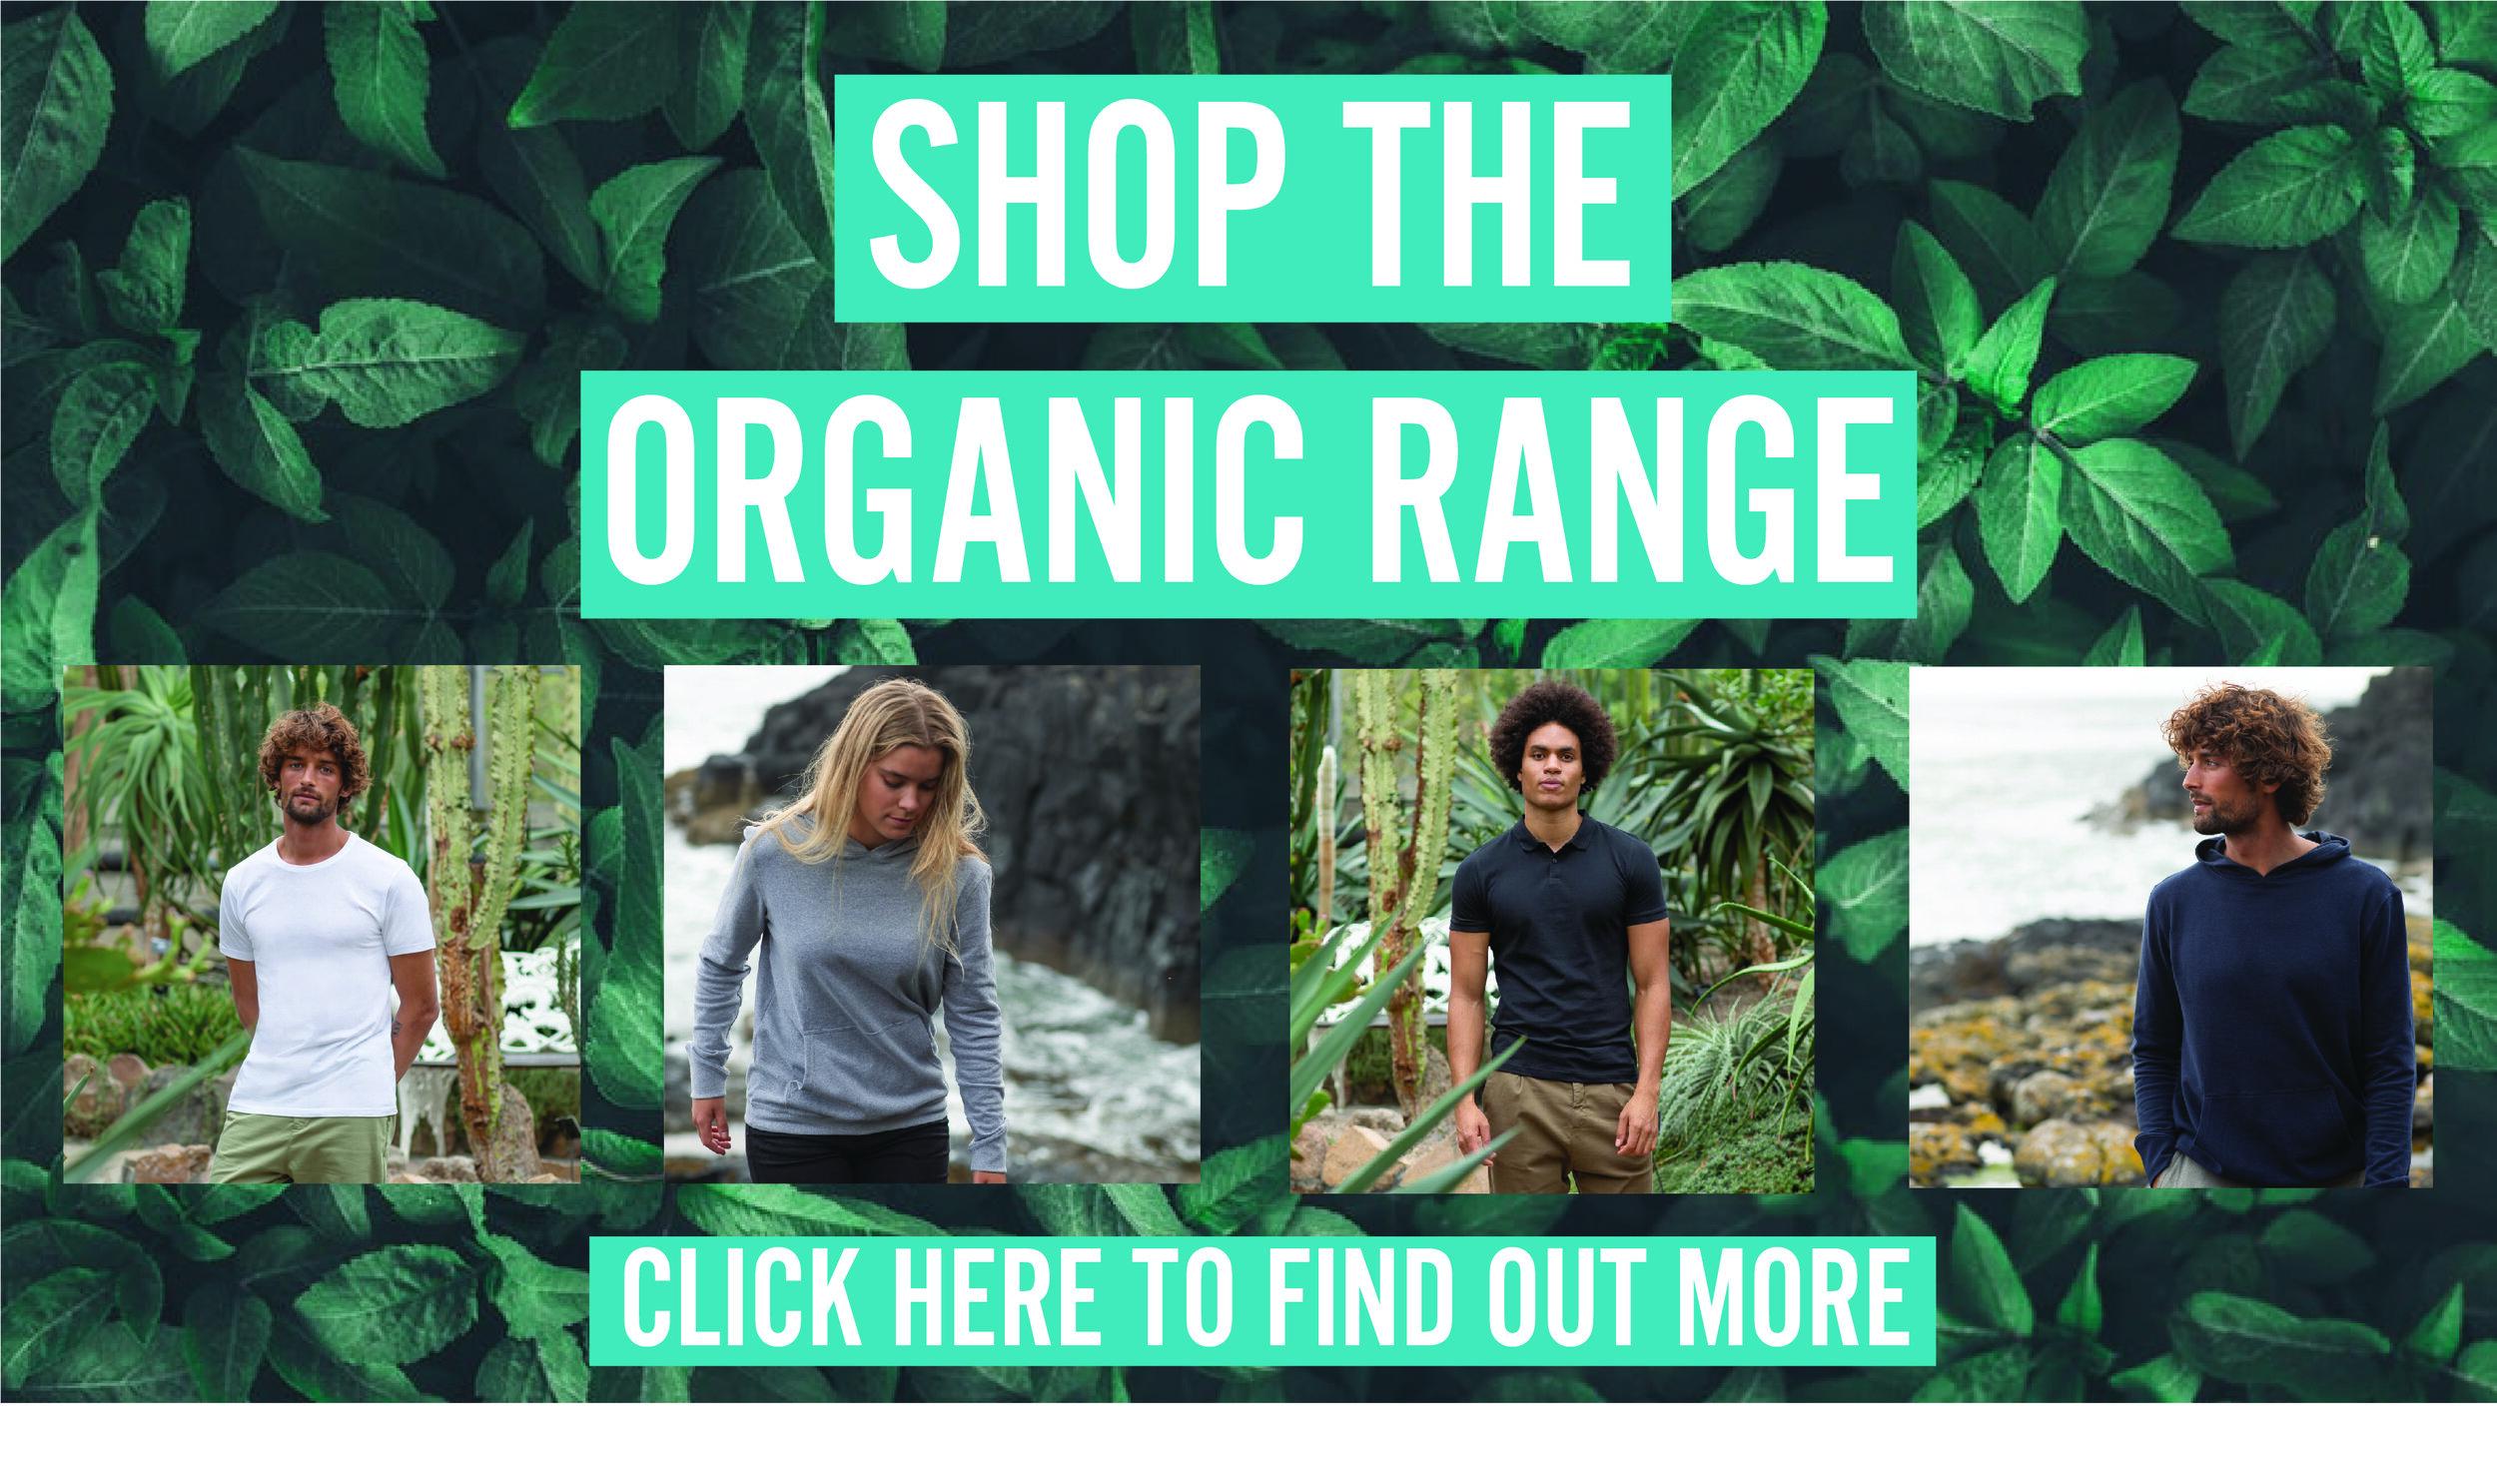 Shop THE organic range.jpg